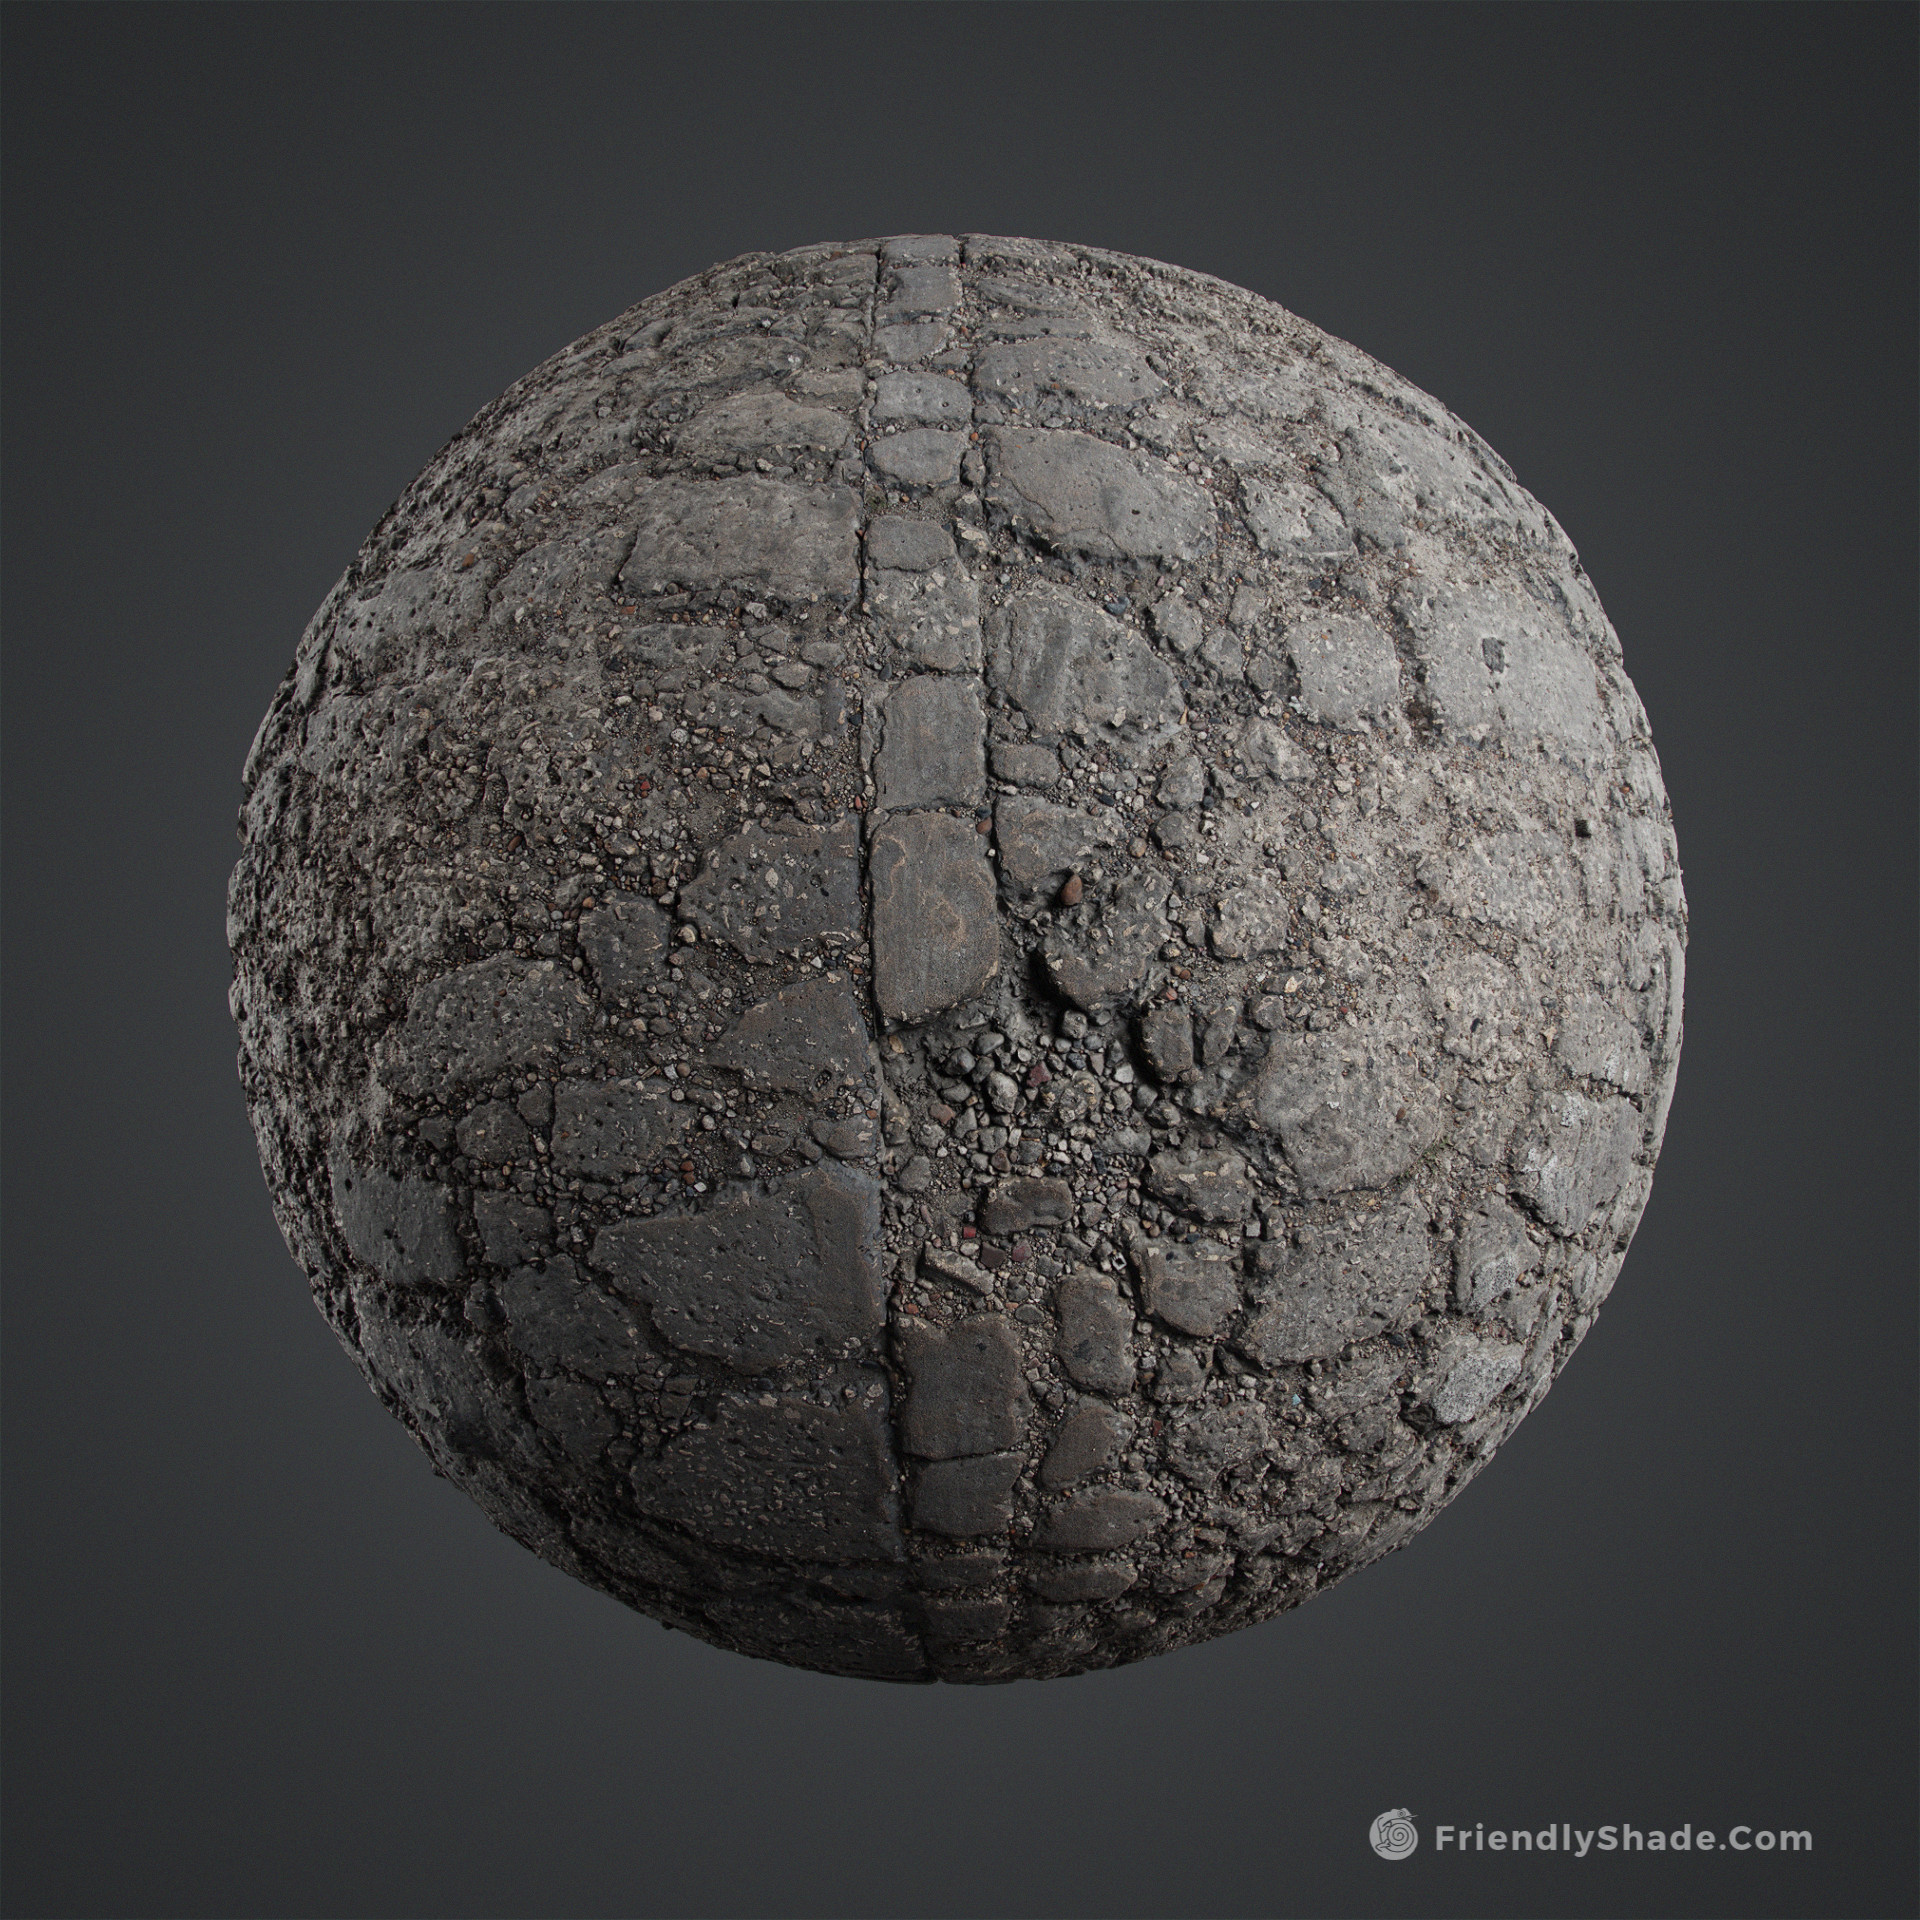 https://cdnb.artstation.com/p/assets/images/images/007/233/267/large/sebastian-zapata-sphere-post.jpg?1504649025